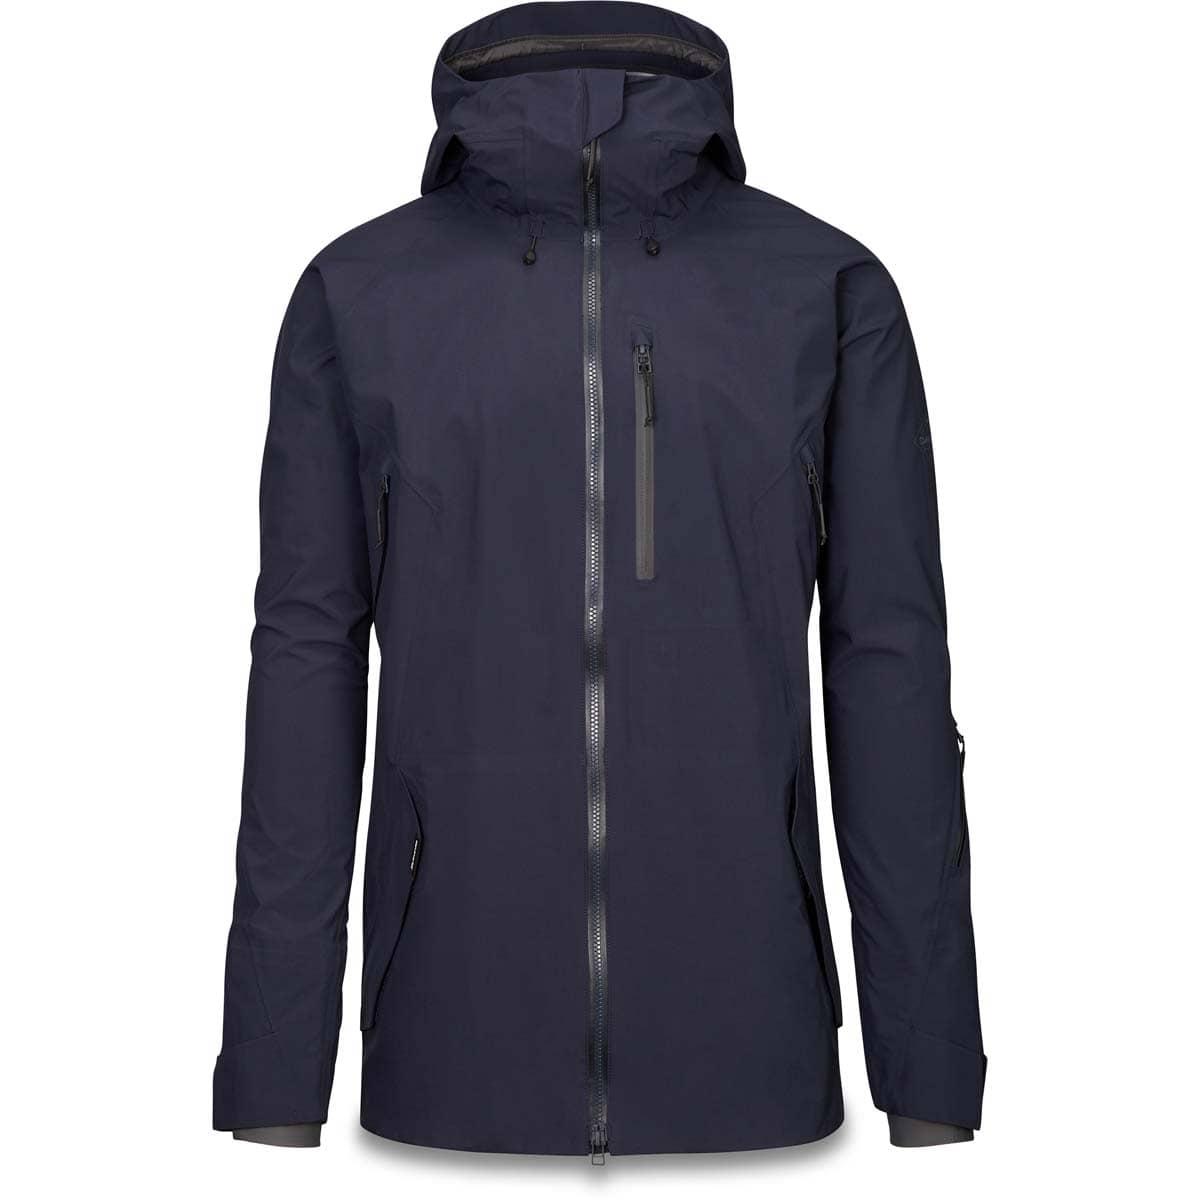 huge selection of b3d0e 41e0b Dakine Gearhart Gore-Tex 3L Jacket Ski- / Snowboard Jacket Night Sky